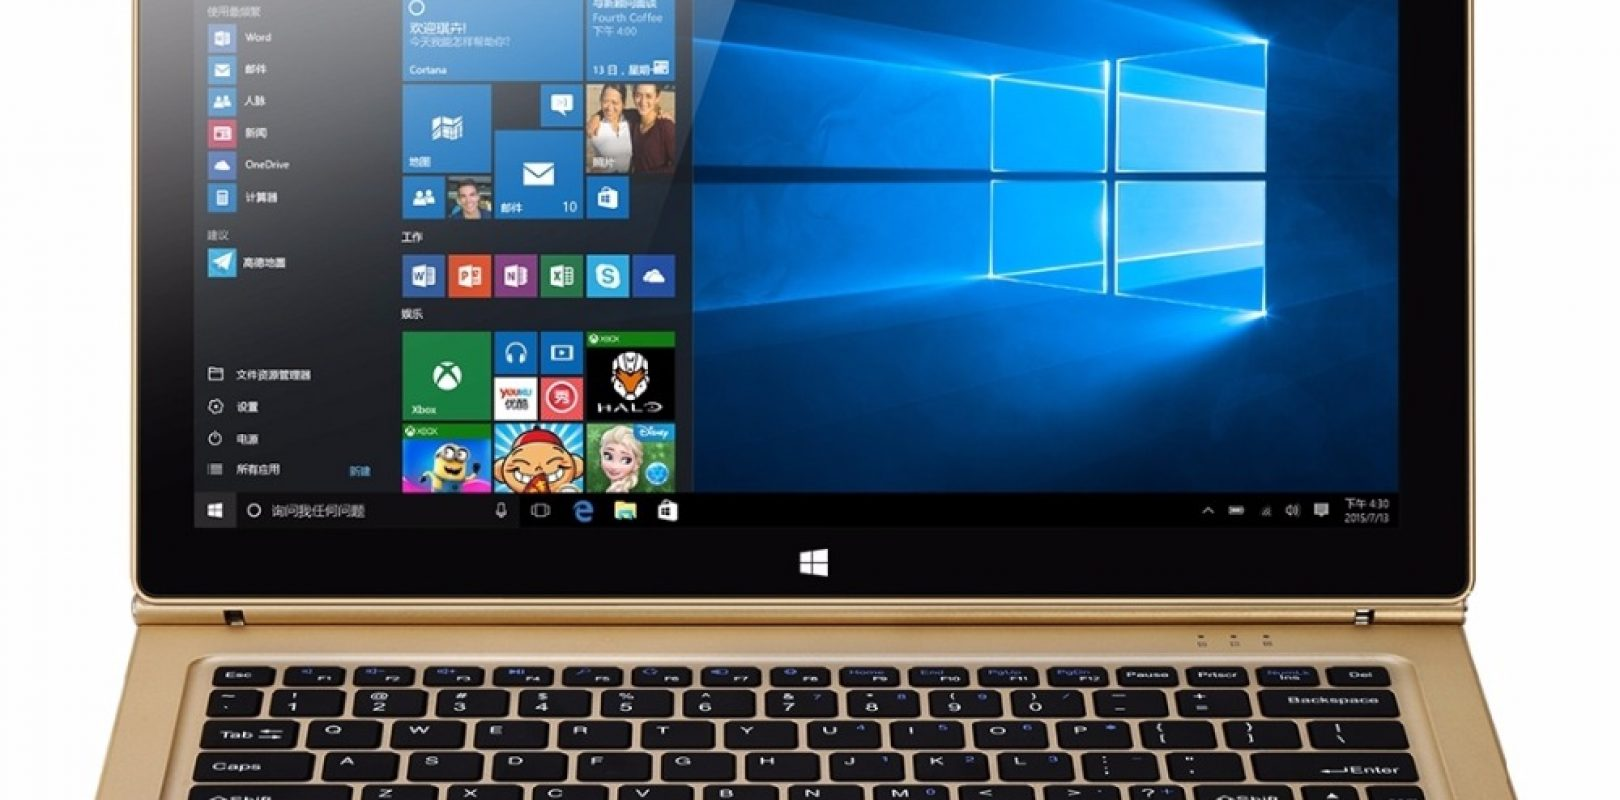 Onda Obook 11 Pro - $299 Core M3-7Y30 Windows 10 Tablet - TechTablets